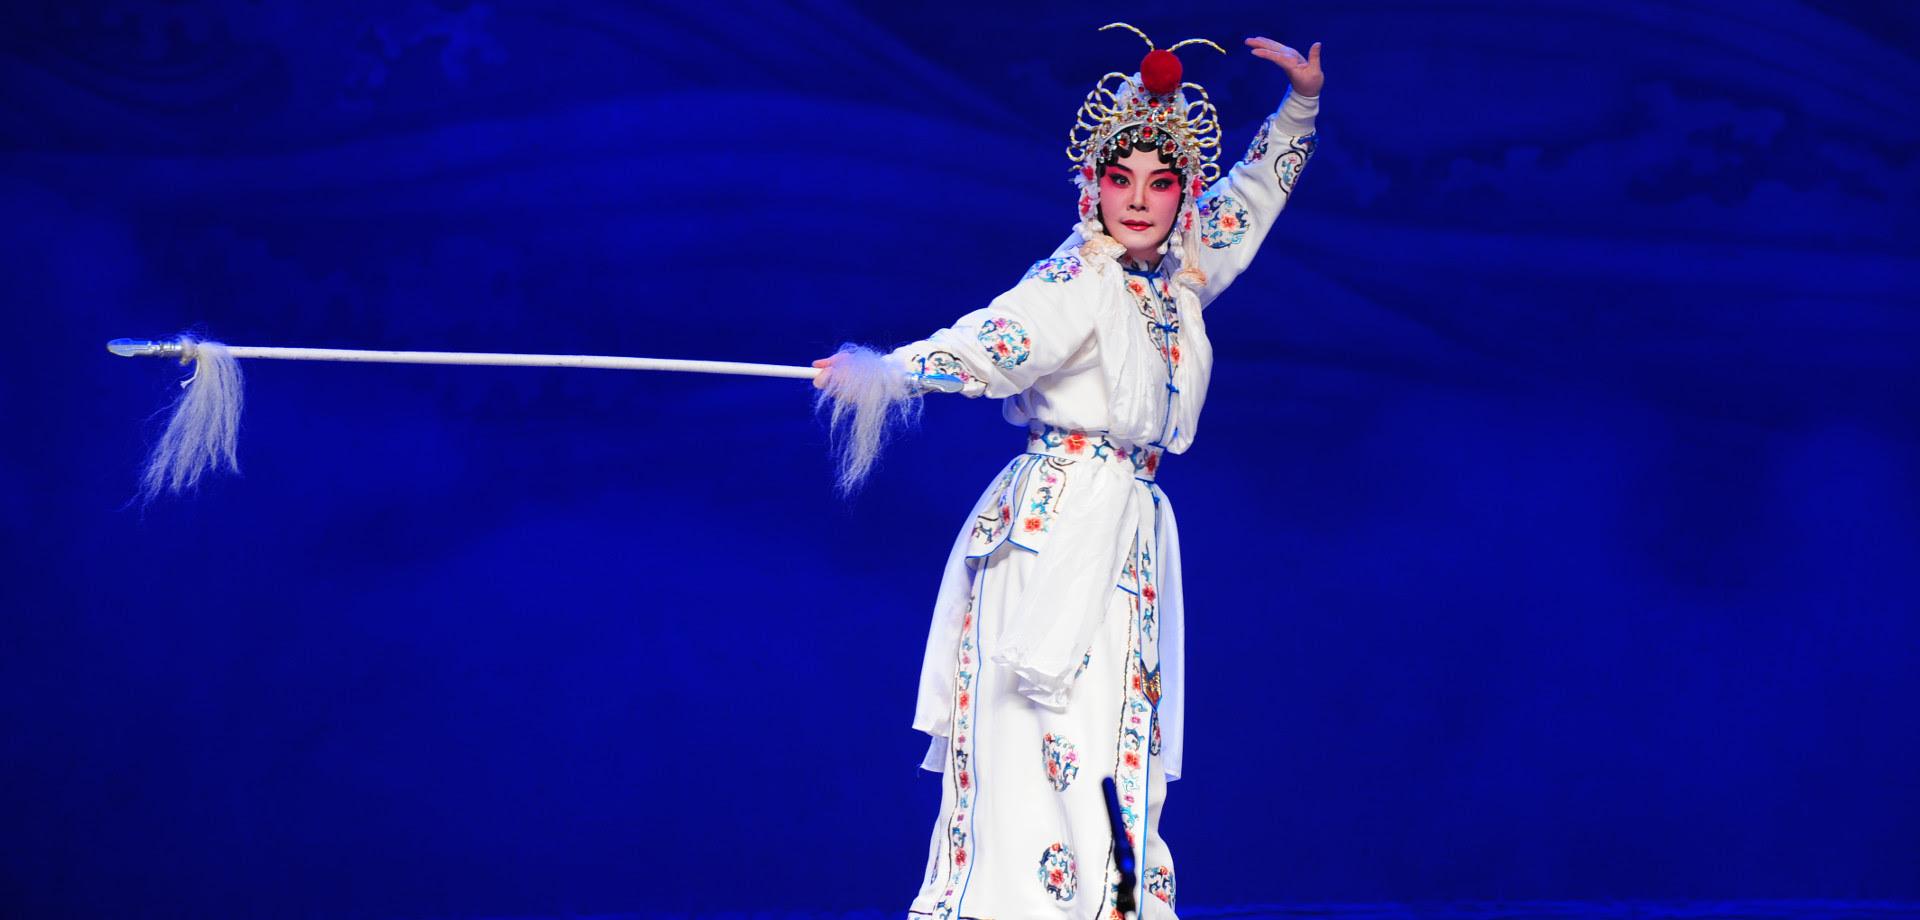 Image result for Η Όπερα Κουν της Σαγκάης στο Κέντρο Πολιτισμού Ίδρυμα Σταύρος Νιάρχος Κεντρική Σκηνή Εθνικής Λυρικής Σκηνής - Αίθουσα Σταύρος Νιάρχος, ΚΠΙΣΝ